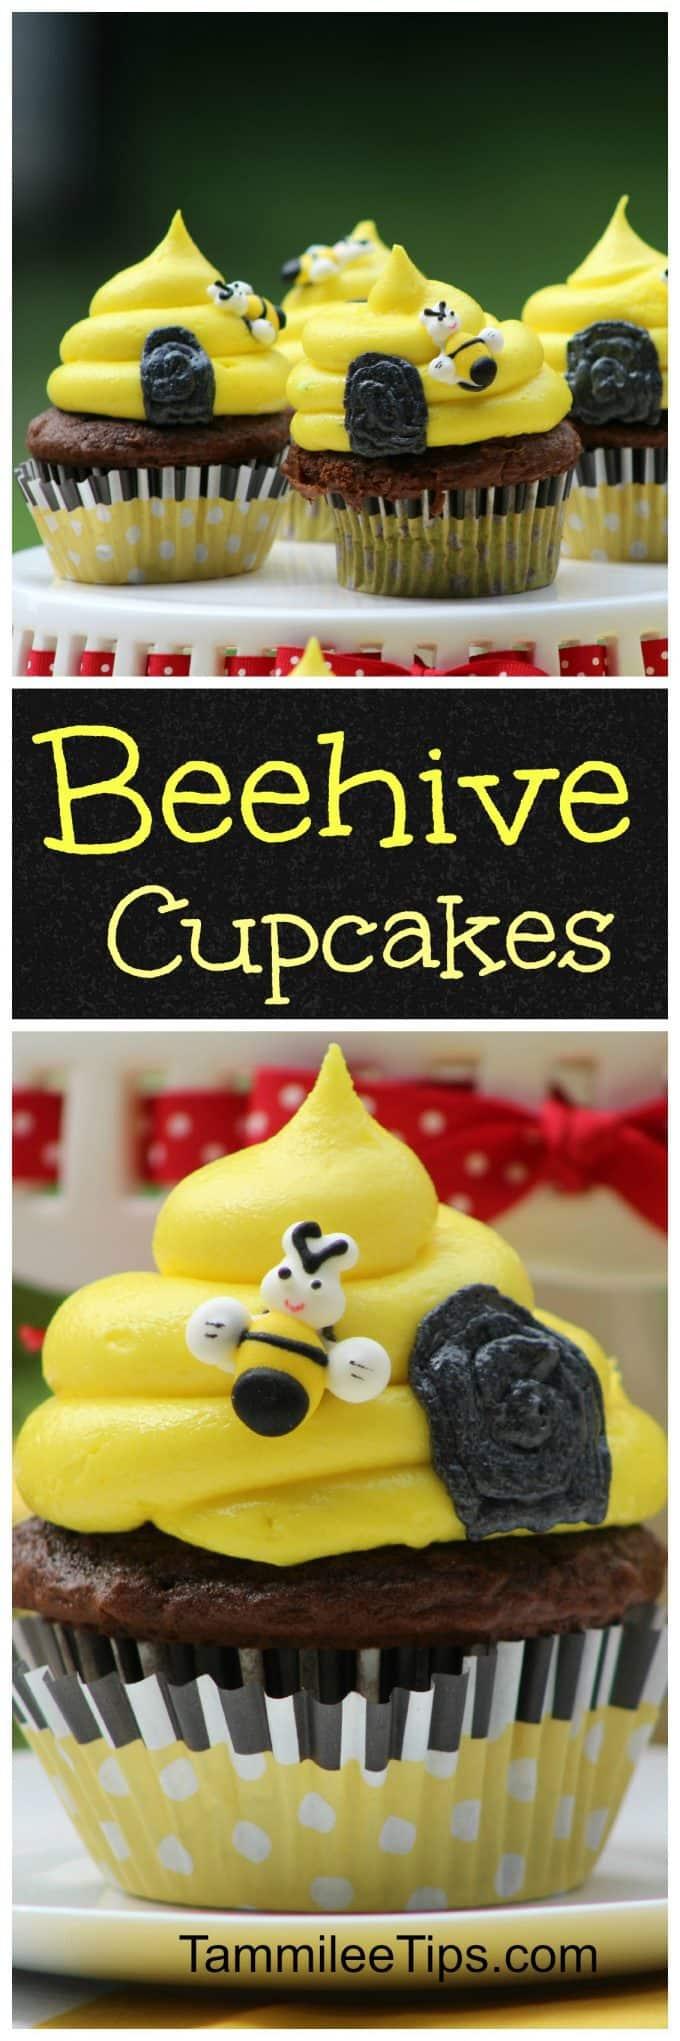 seriously cute honey bee beehive cupcake recipe